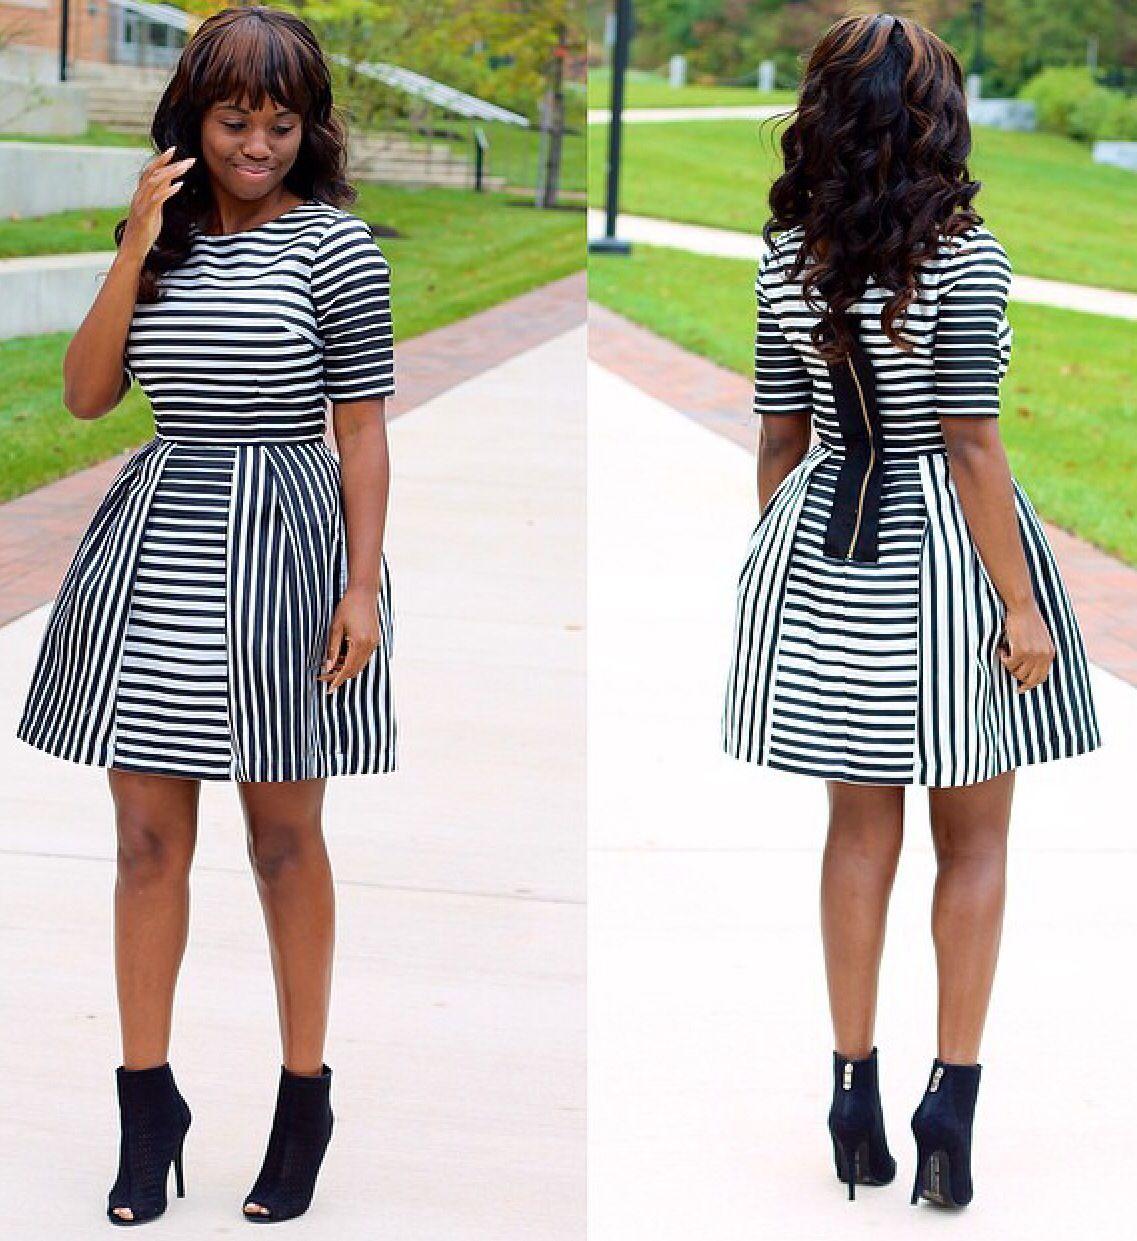 Cute Dress   ~MY FASHION STYLE #2~   Pinterest   Clothes, Fashion ...